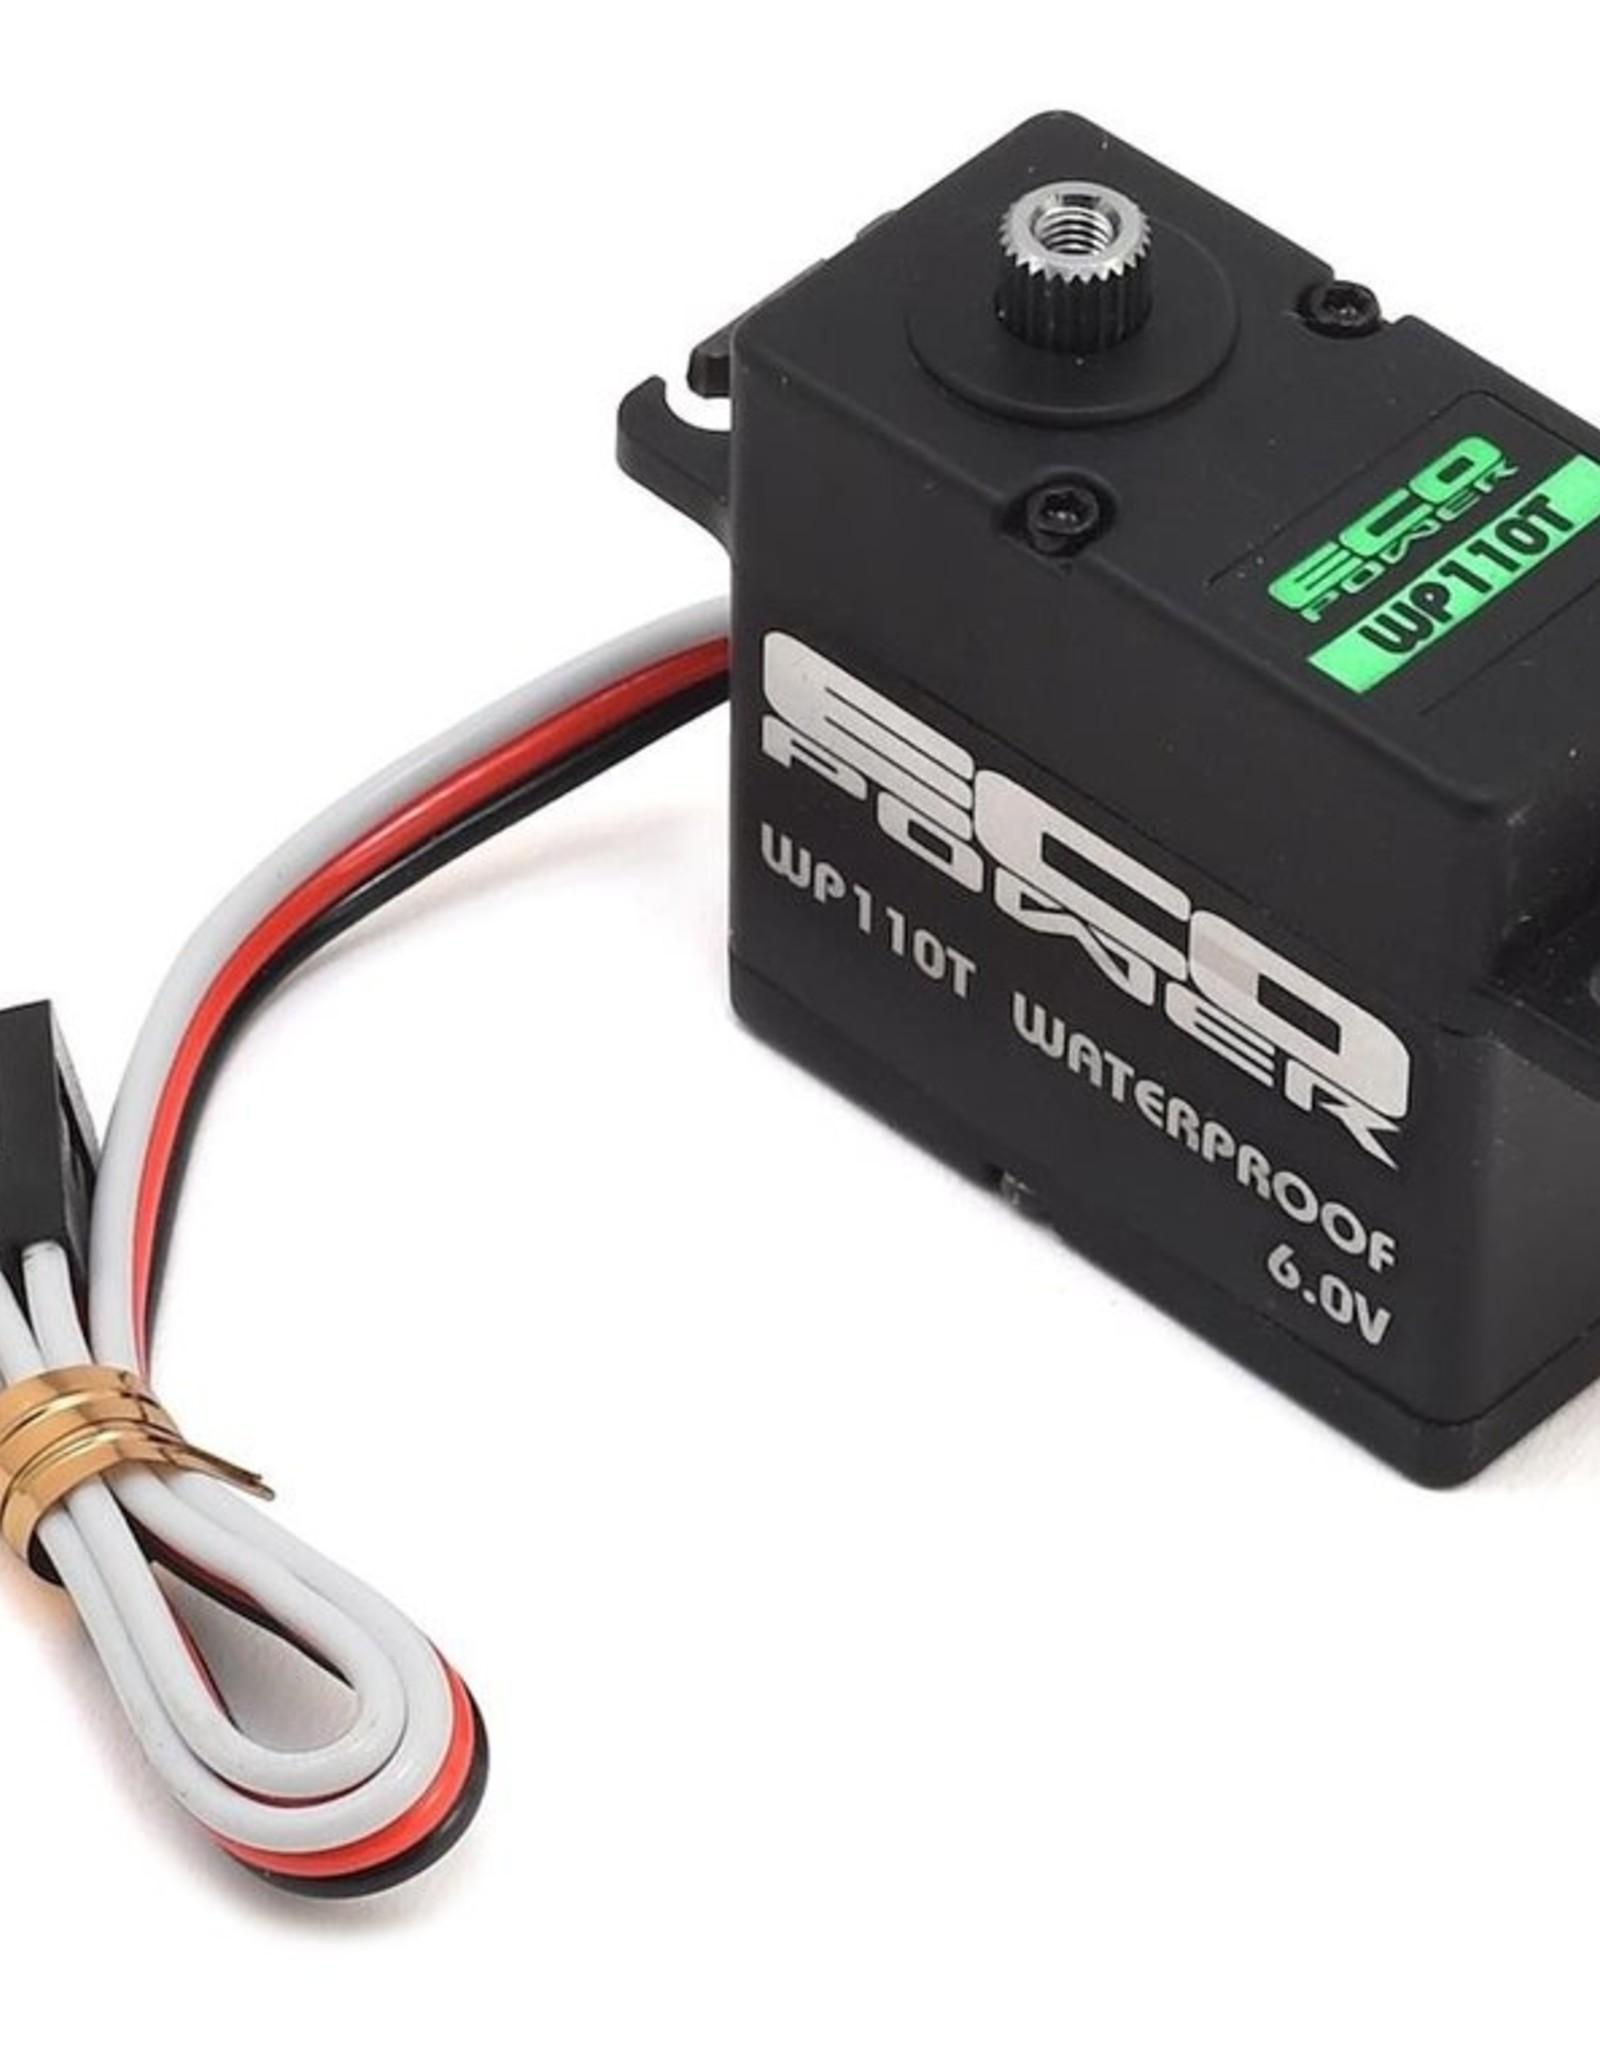 ECO Power EcoPower WP110T Cored Waterproof High Torque Metal Servo